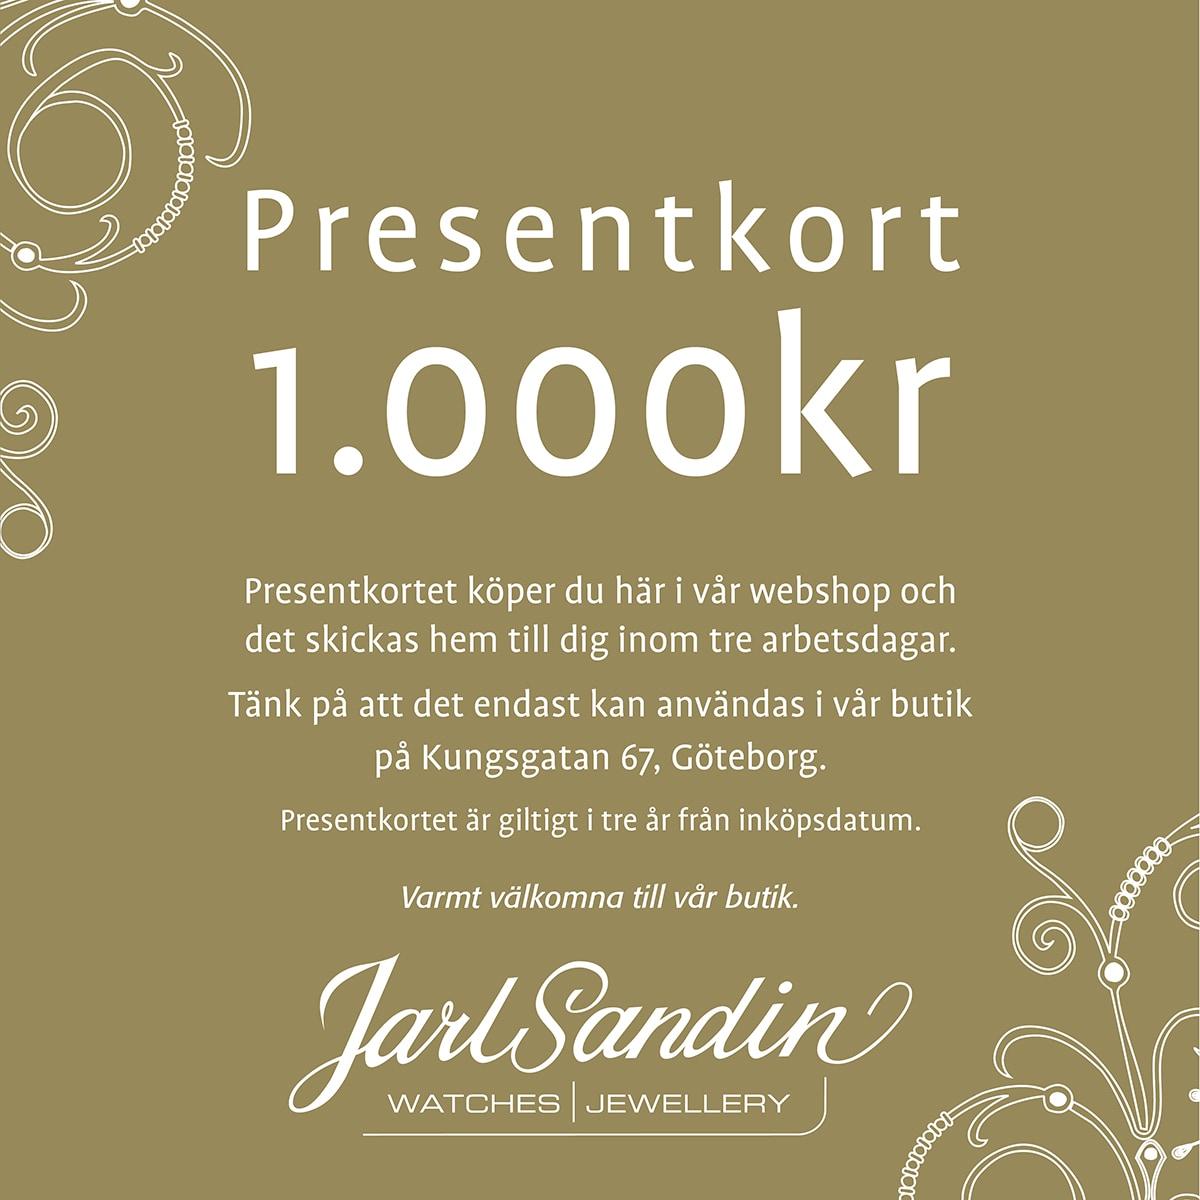 Presentkort_Jarl_Sandin_ 1000kr